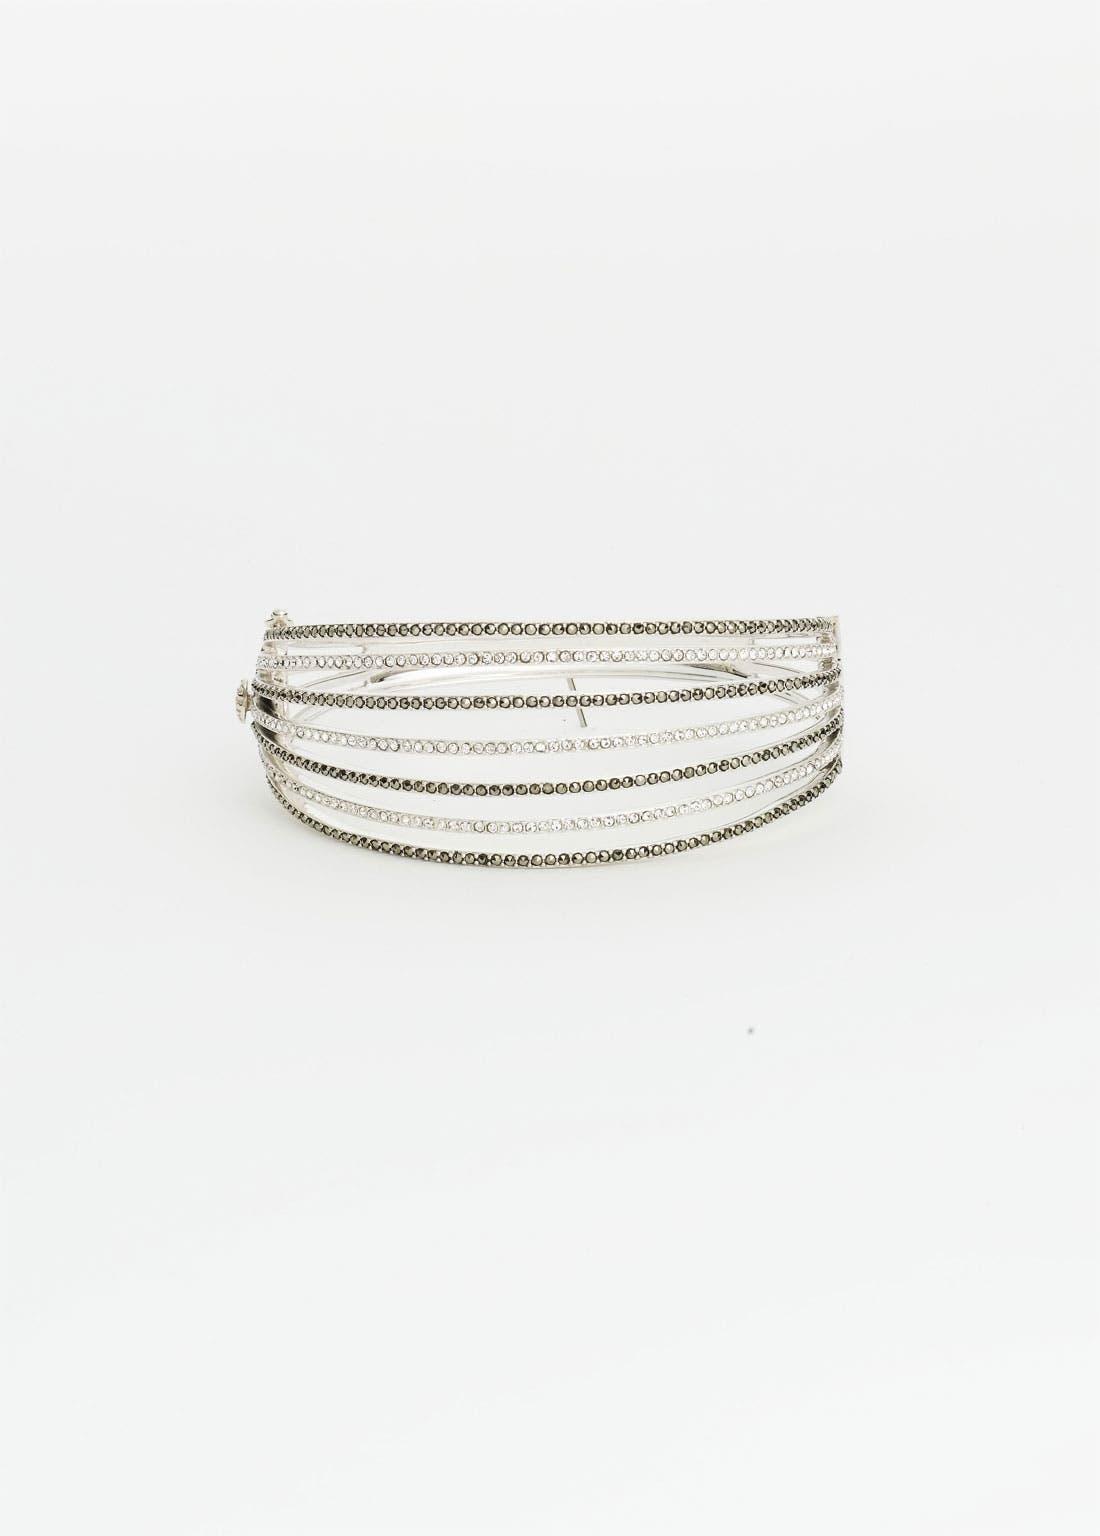 Alternate Image 1 Selected - Judith Jack 'Crystal Glitz' Bangle Bracelet